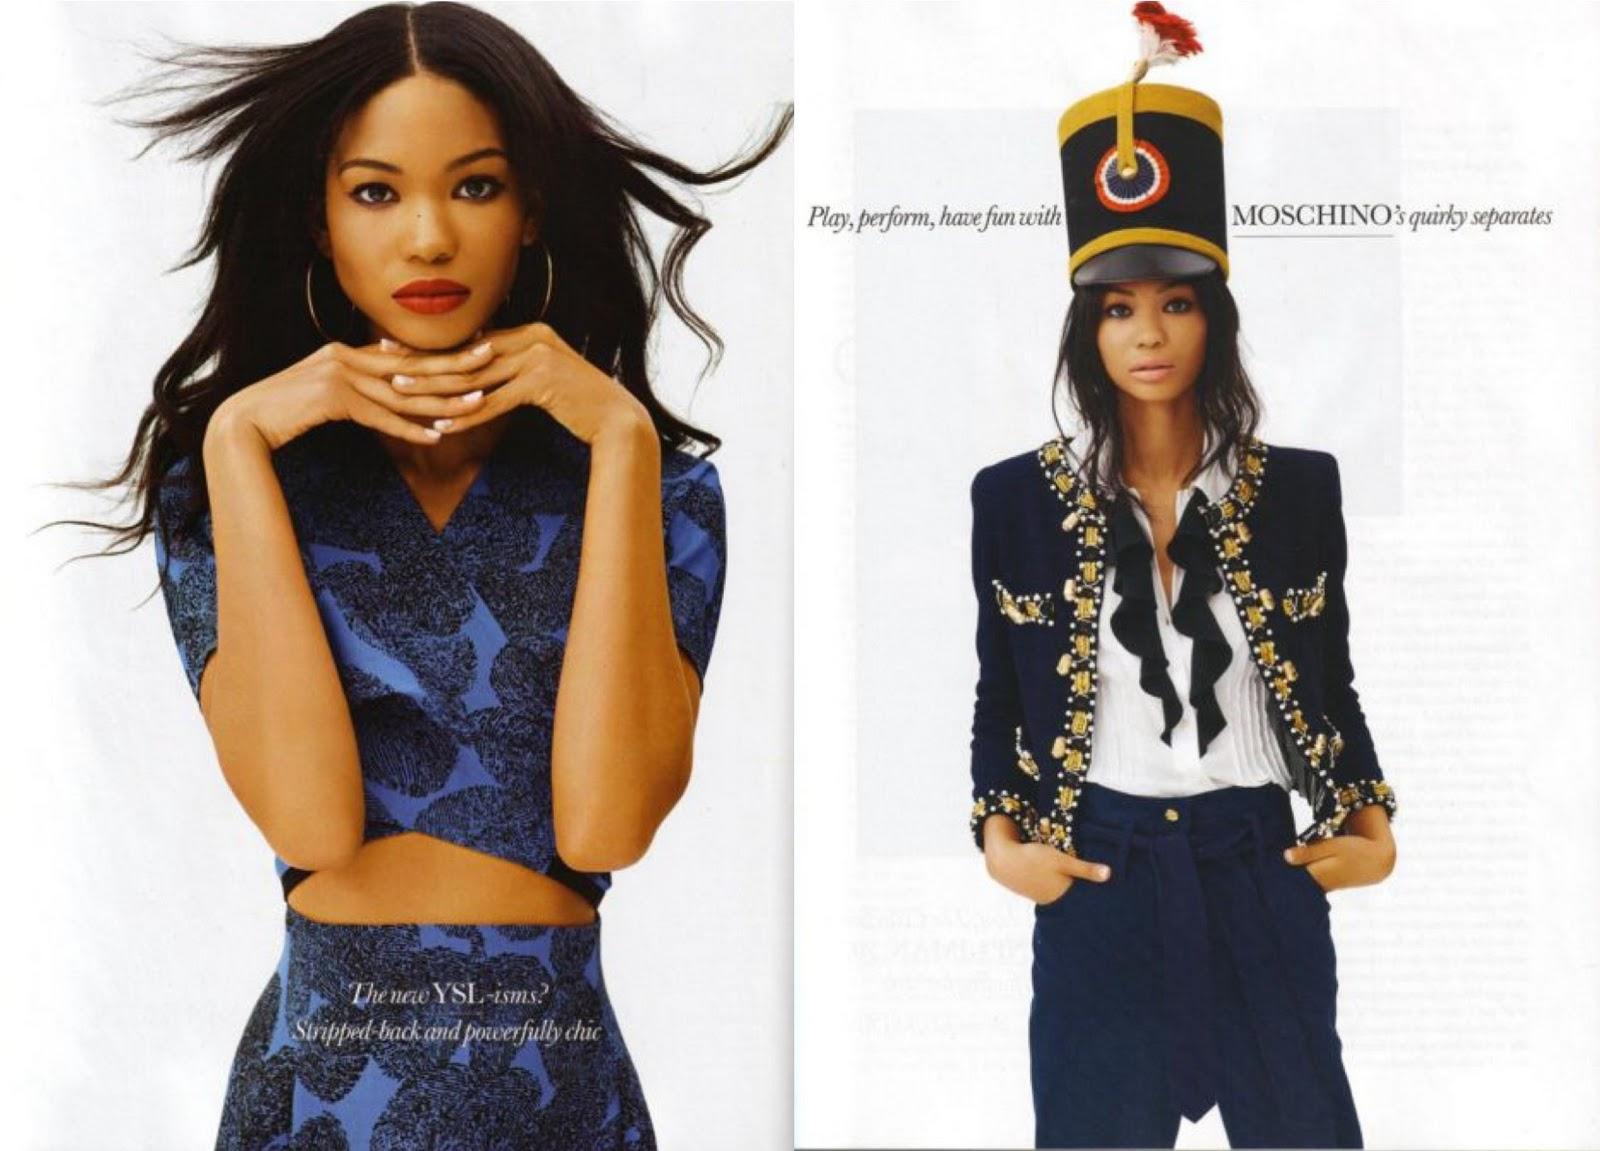 http://3.bp.blogspot.com/_PfmV3qvy8FY/TSvSDNL0aXI/AAAAAAAAA5w/gNCk5ffypUA/s1600/la+modella+mafia+Chanel+Iman+Elle+UK+February+2011+by+David+Vasiljevic+4.jpg